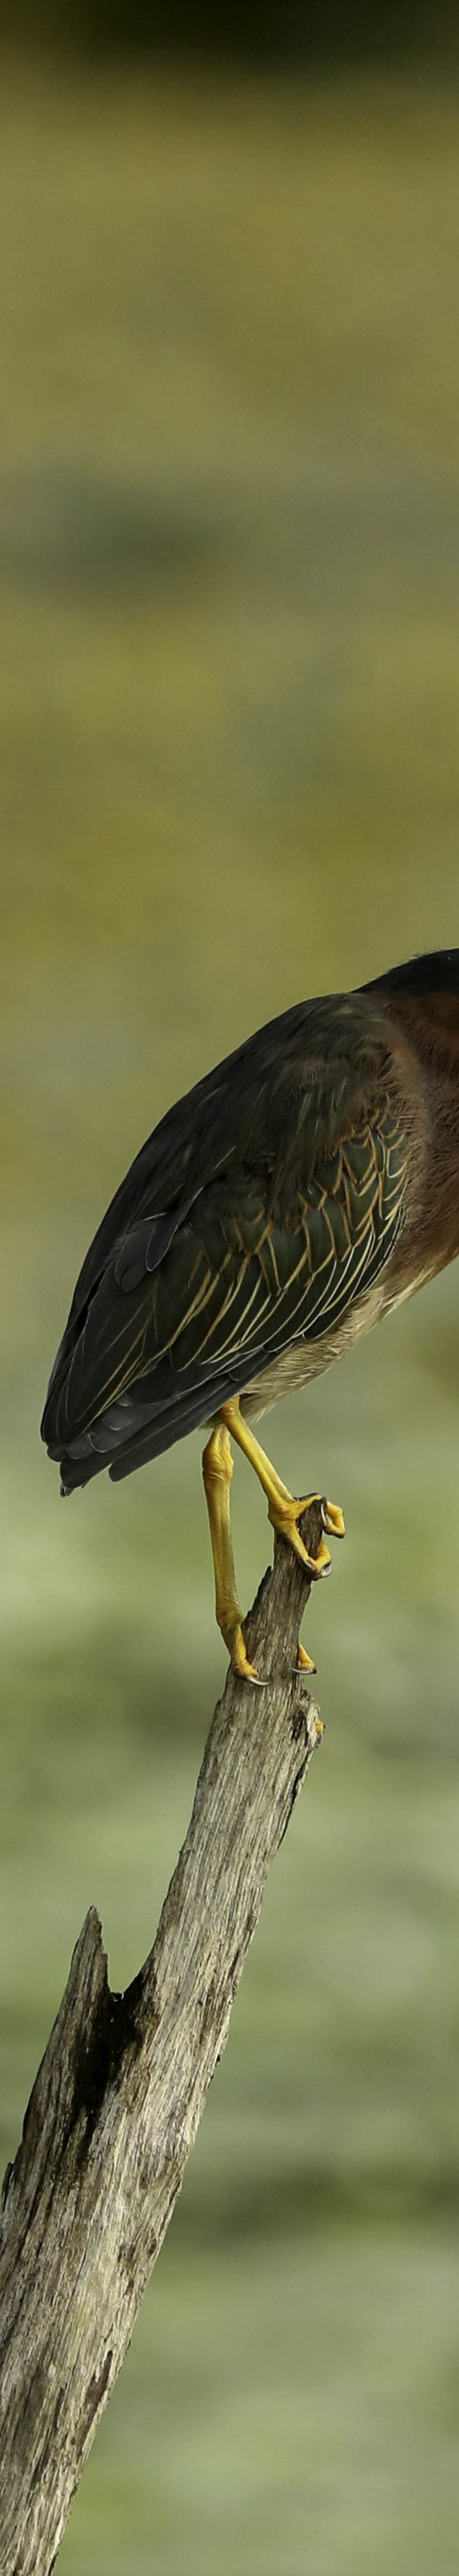 Groene reiger / Green heron (Butorides virescens)